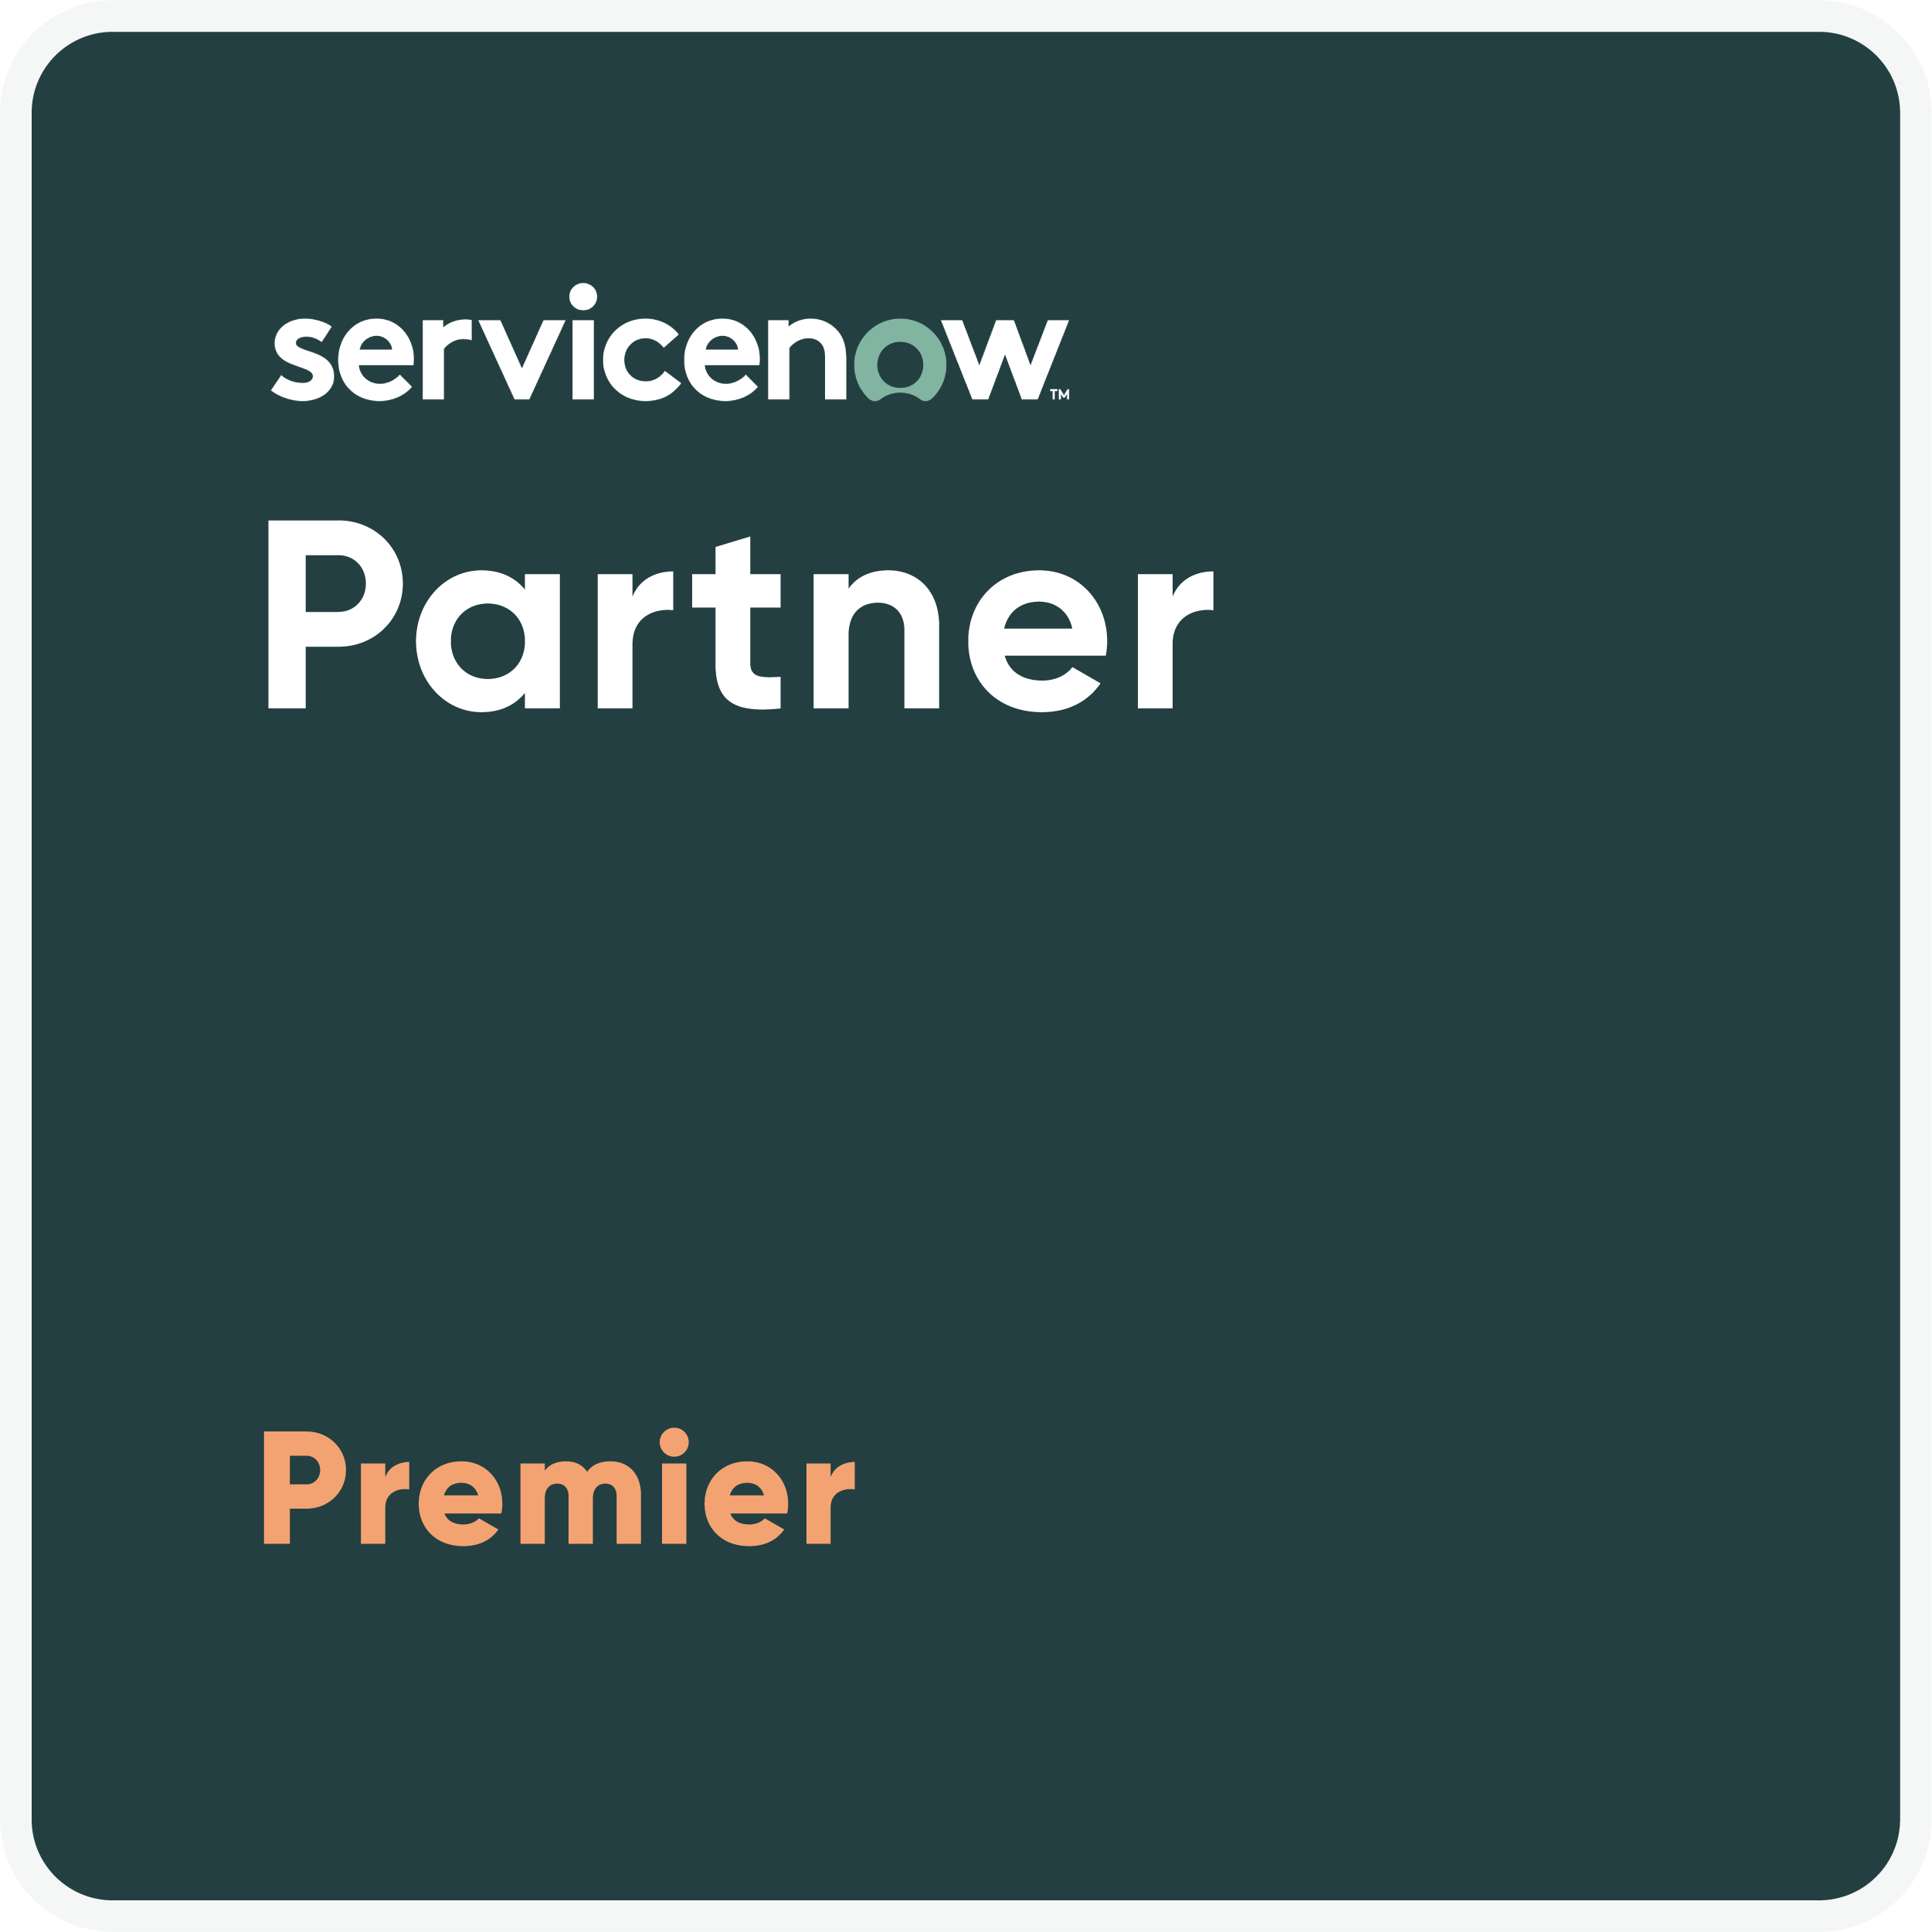 servicenow-partner